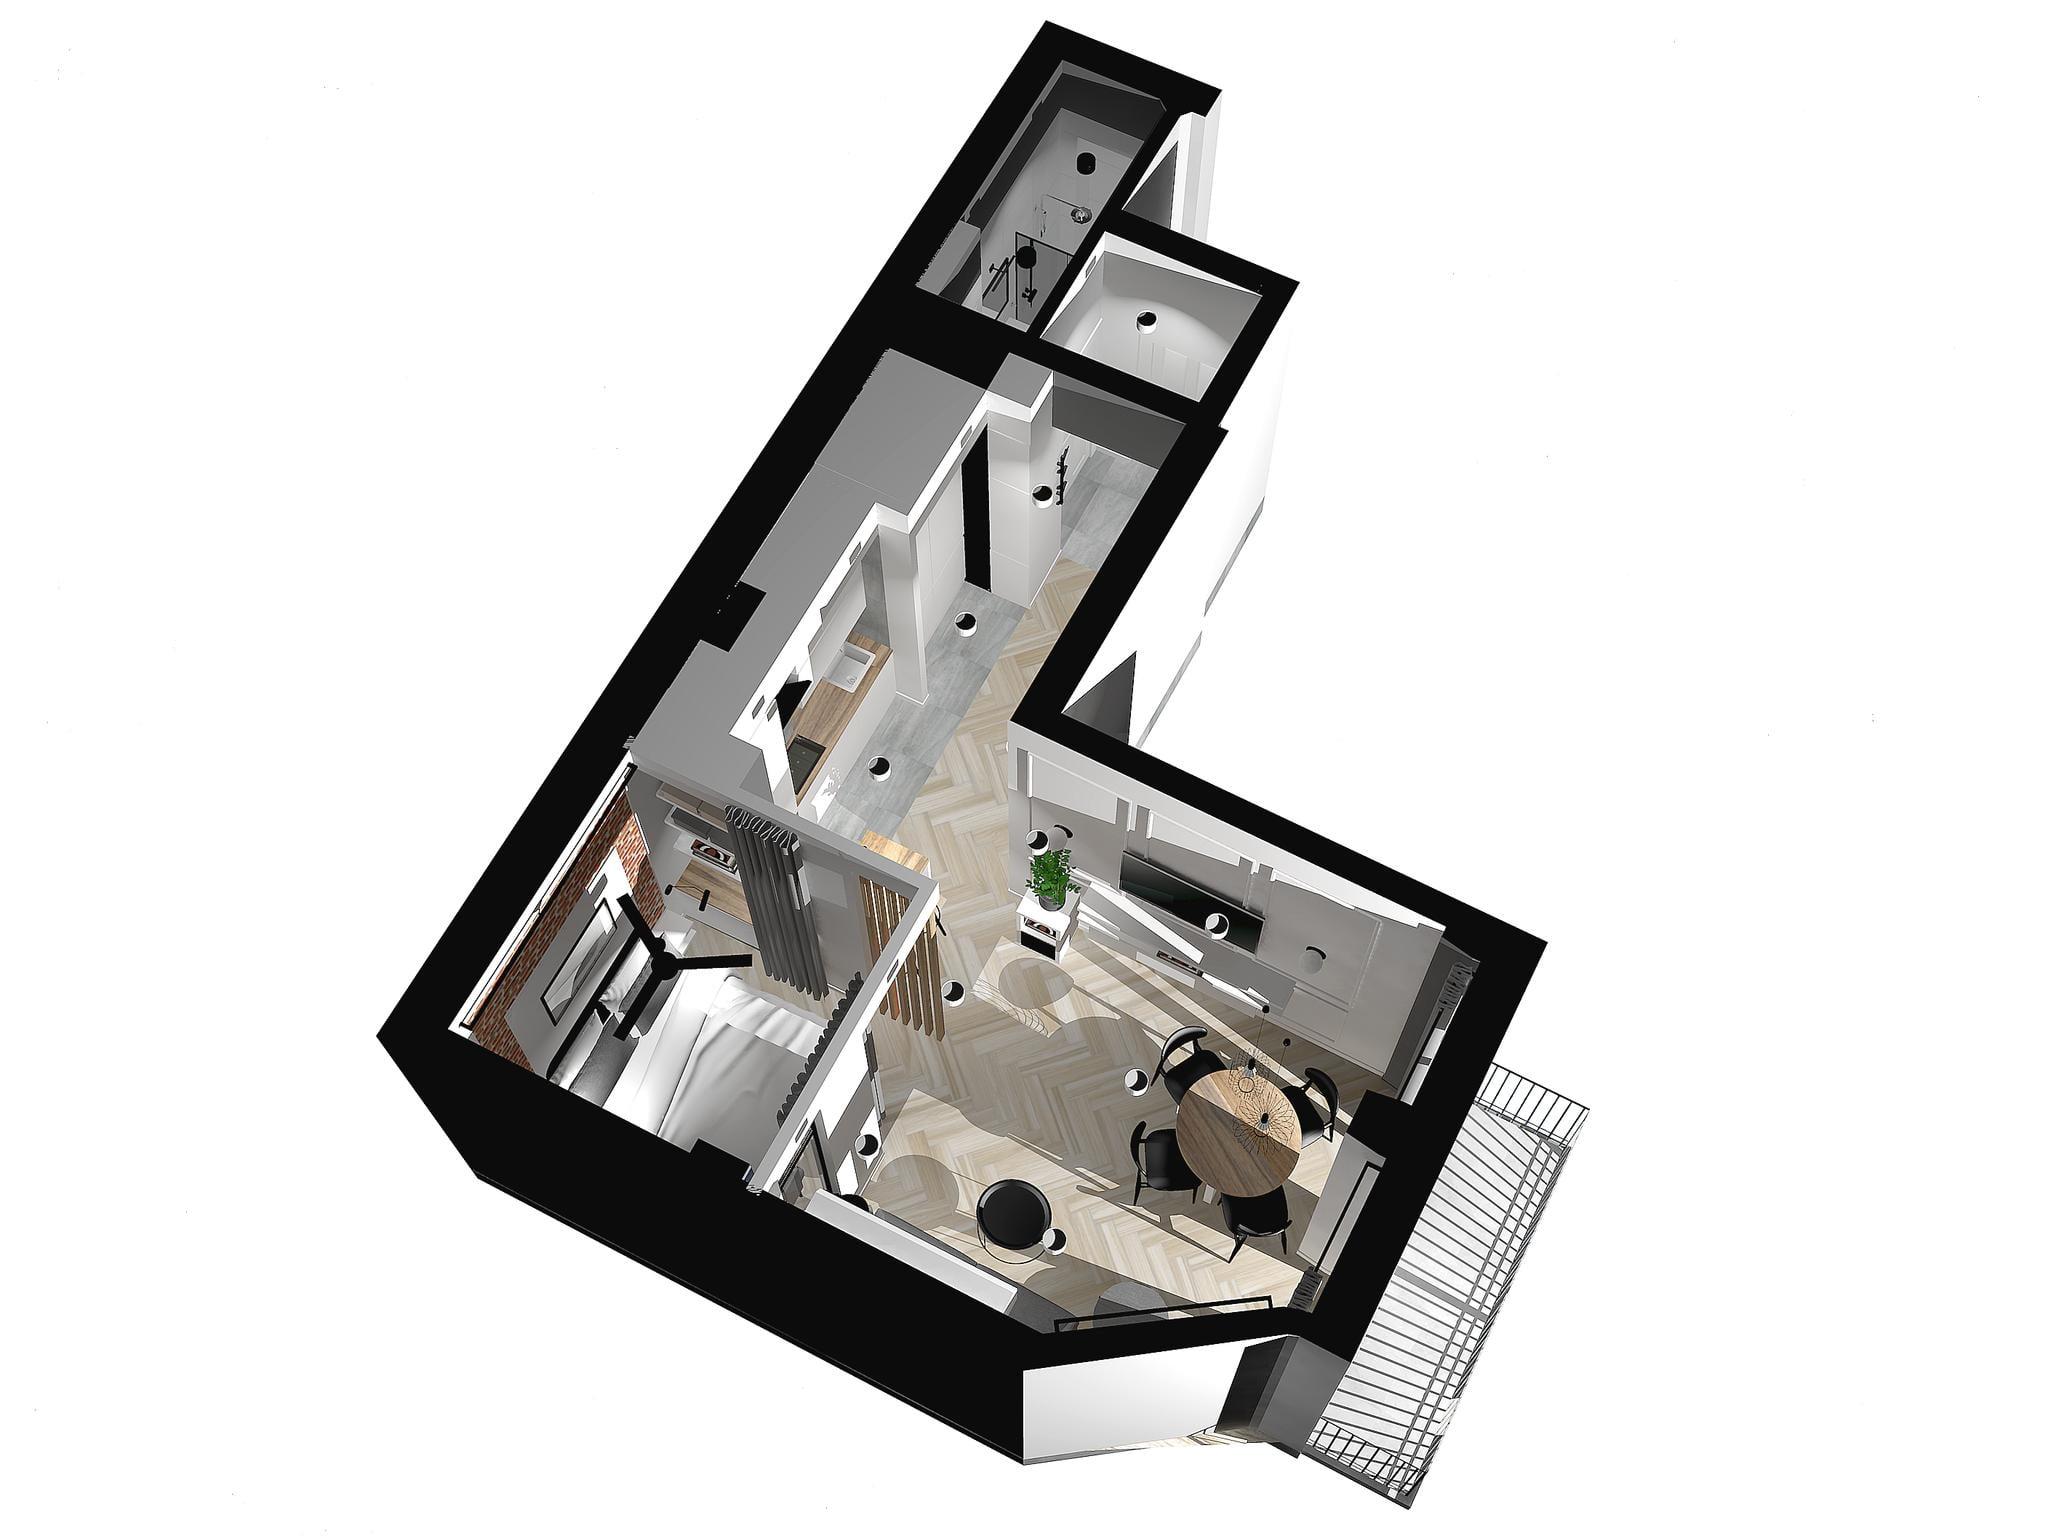 Ulica - Luxury apartment in Krakow